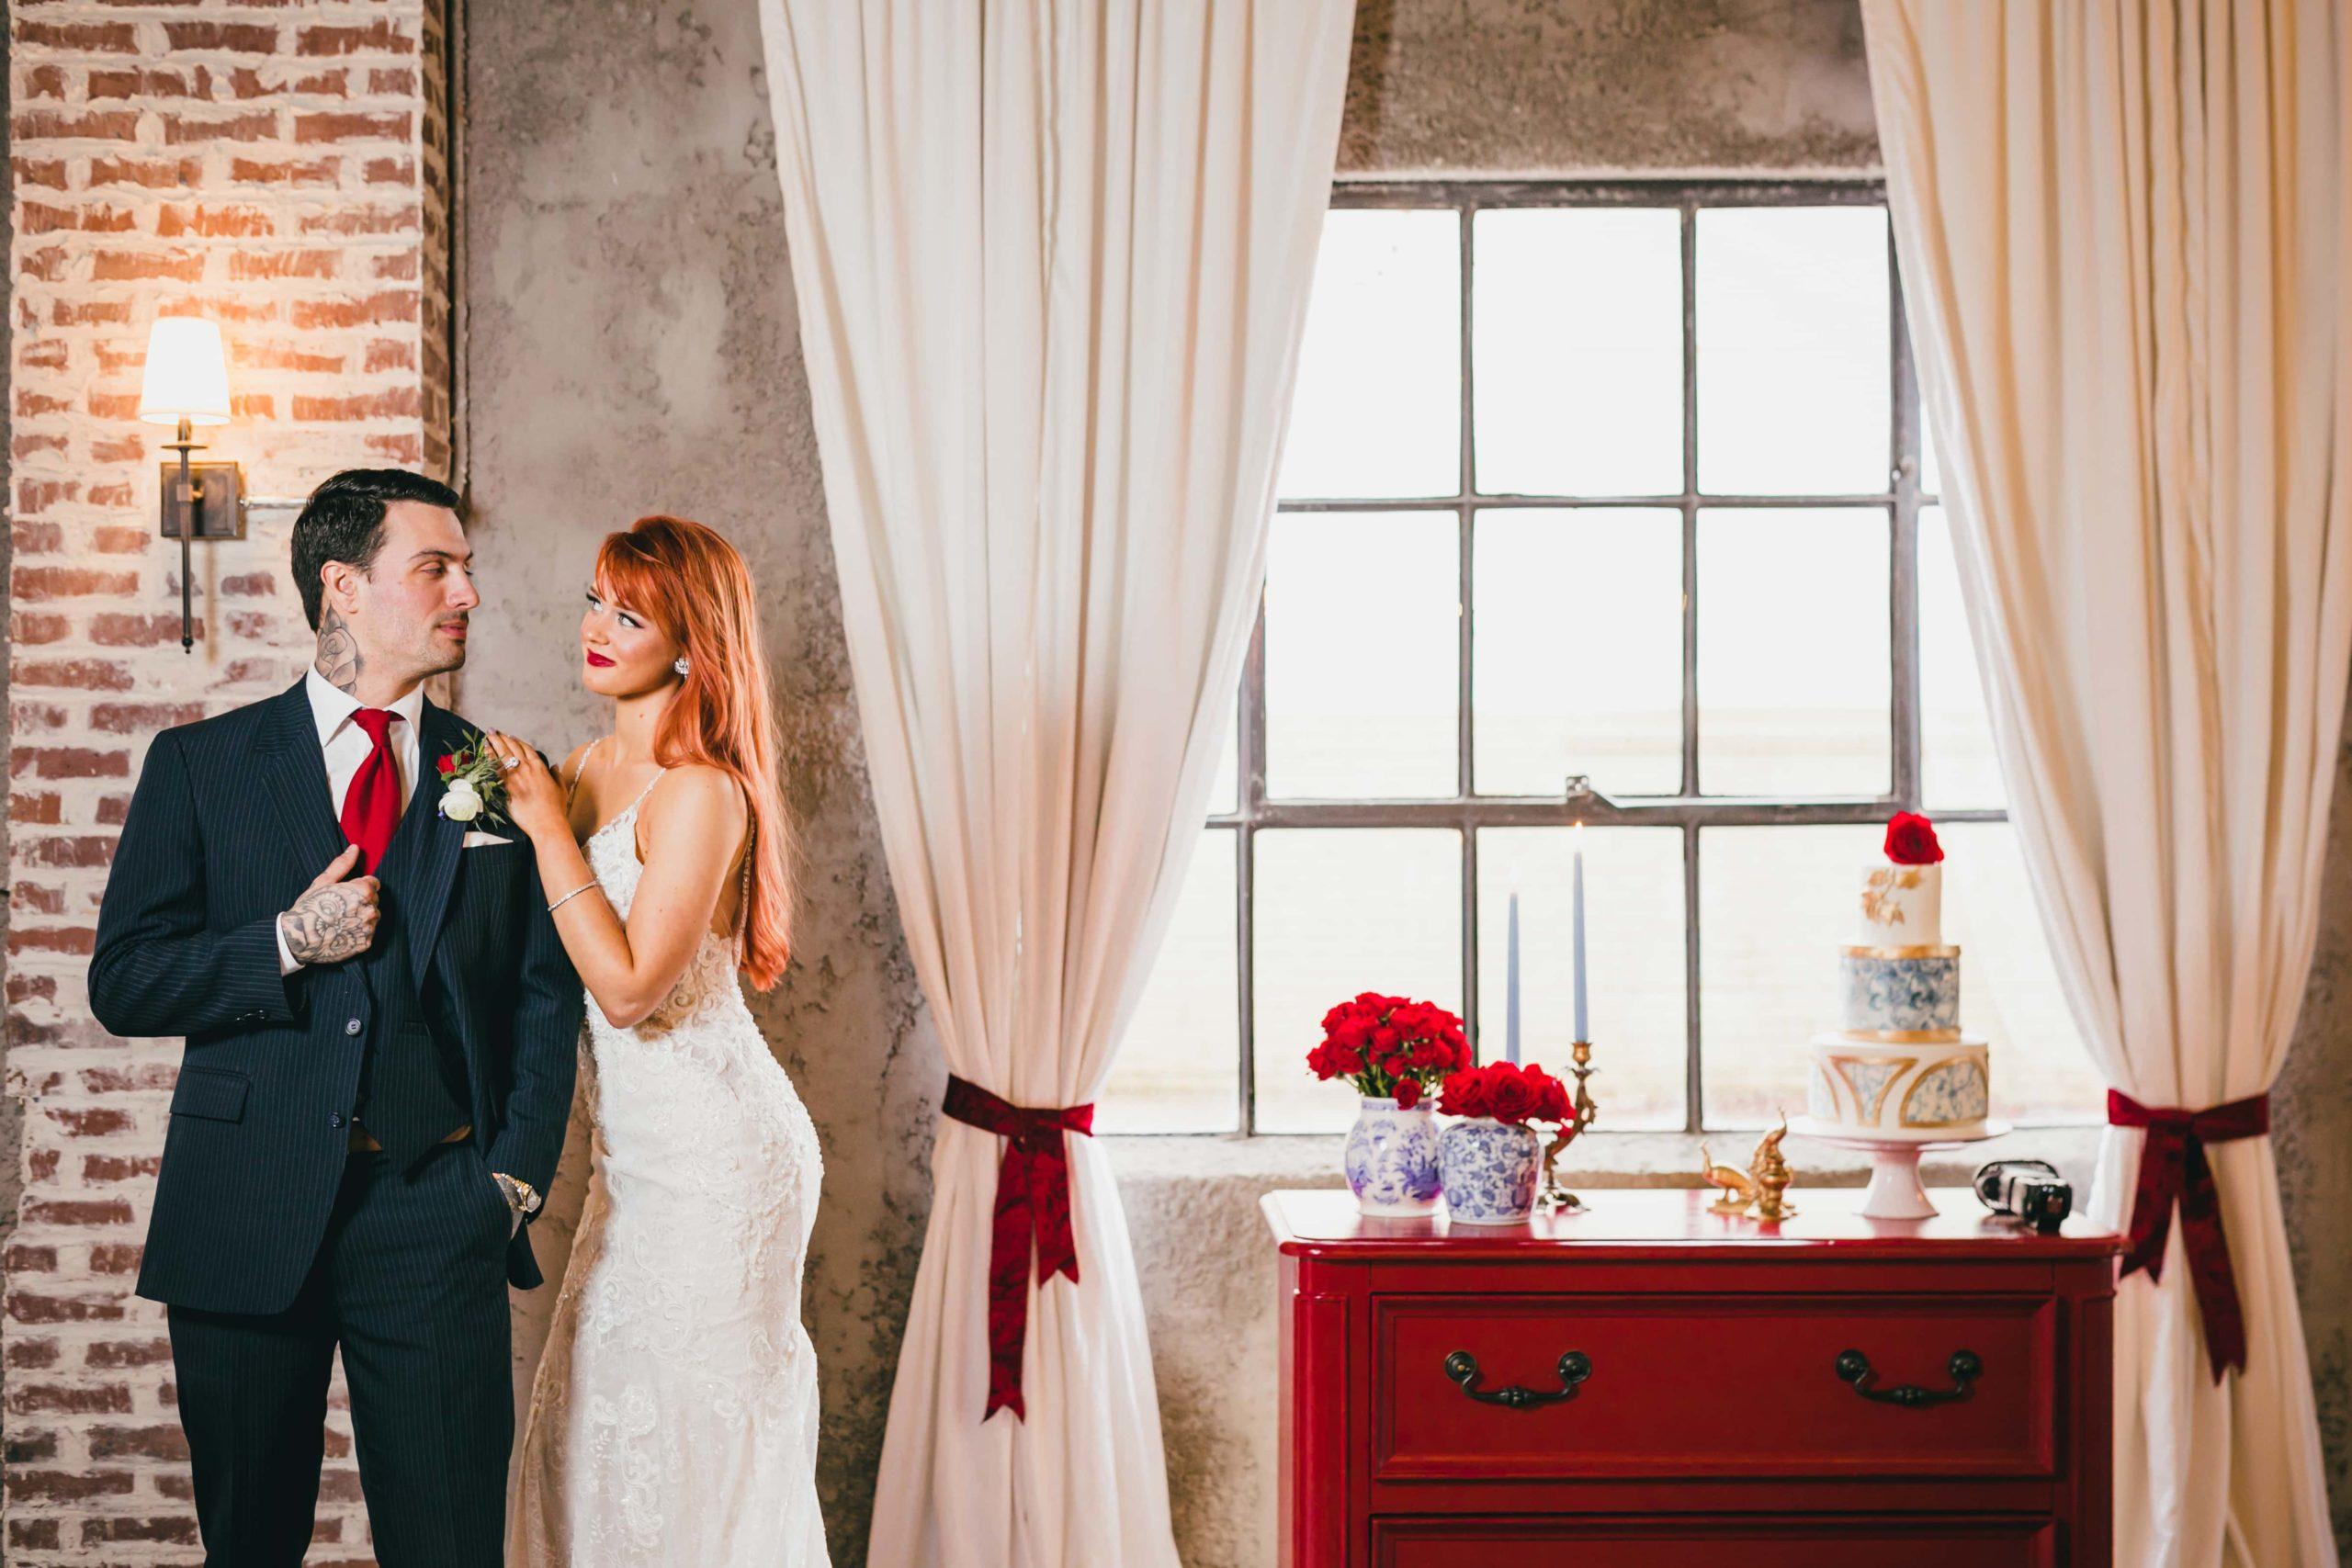 foxglove-styled-shoot-atlanta-wedding-photographers-lsc02399-1-scaled